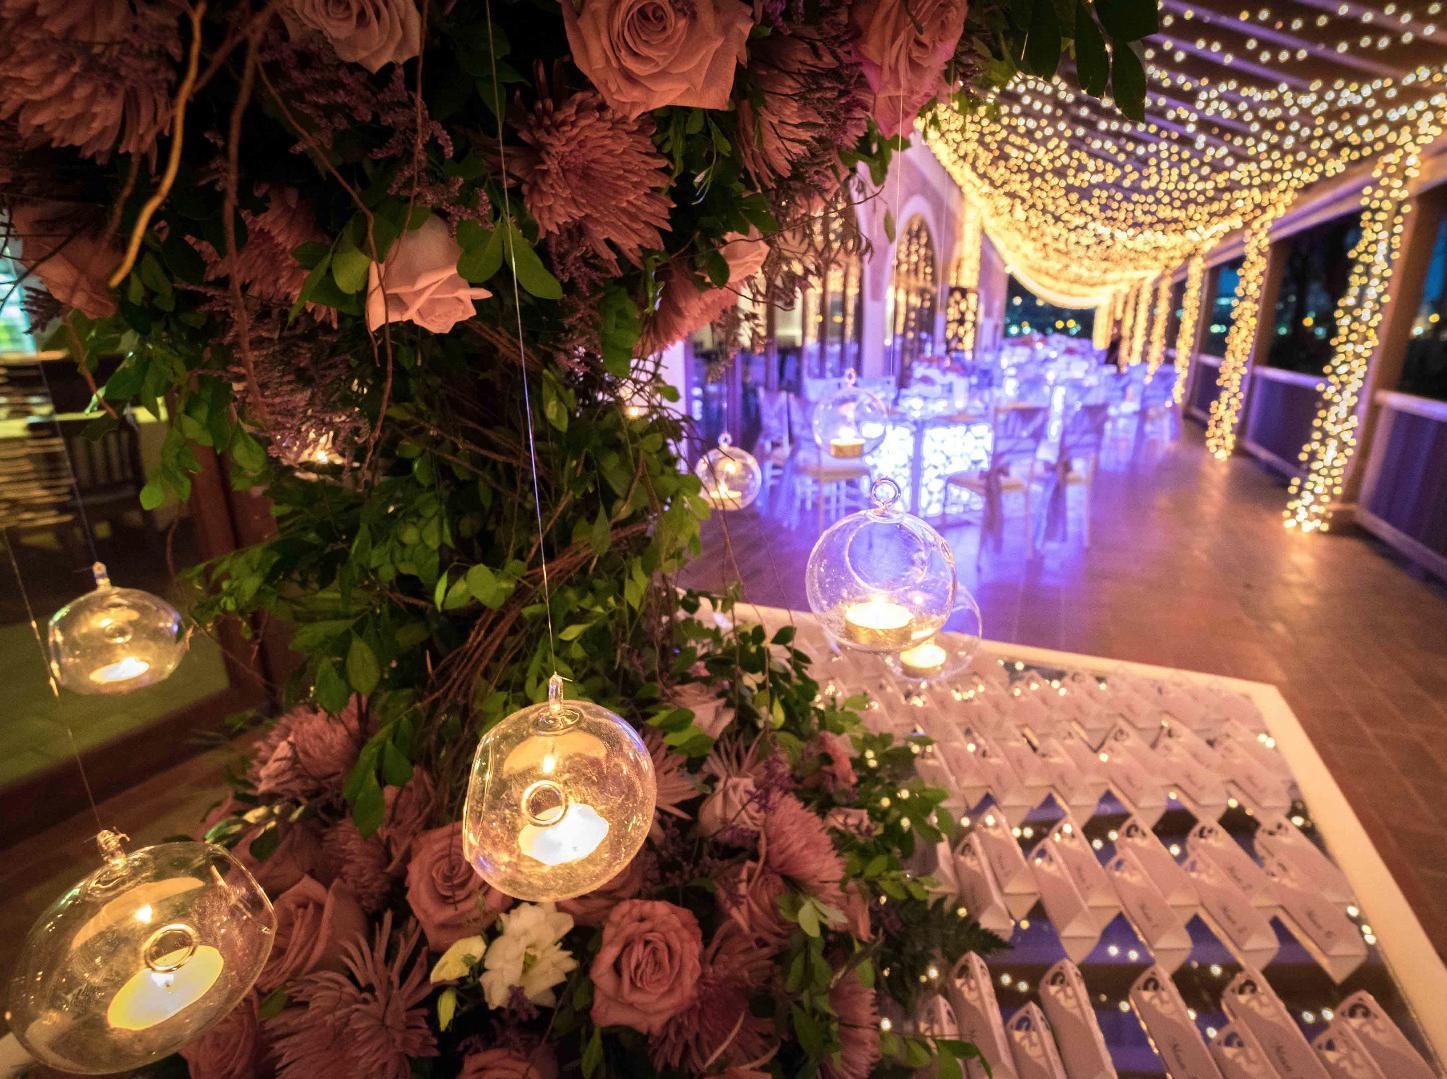 bodas-sin-clasificar-sin-tema-cuba-35911.jpg